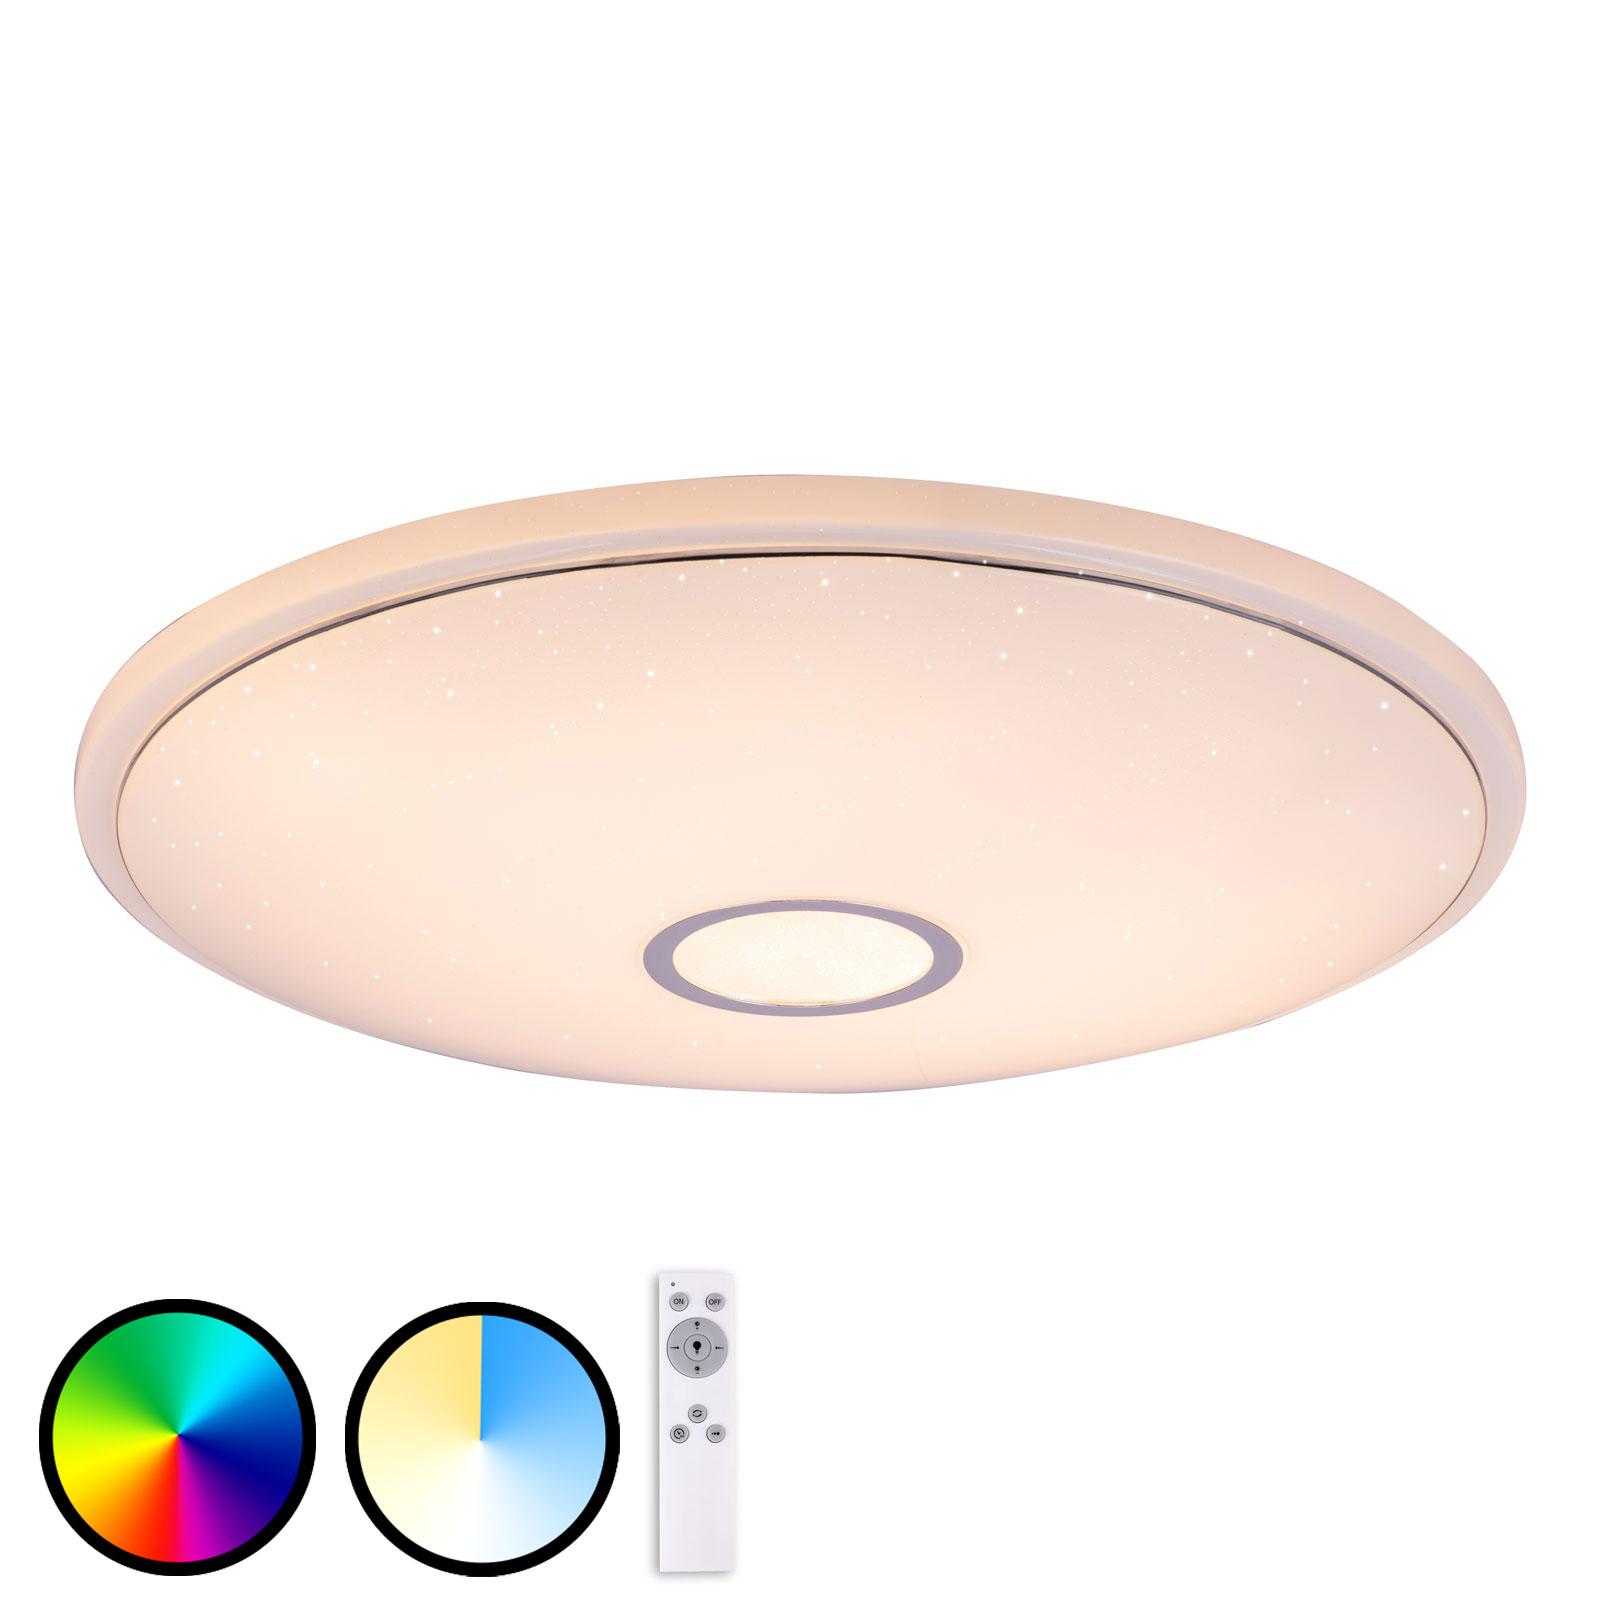 LED-Deckenleuchte Conner, Tuya-Smart, Ø 70 cm